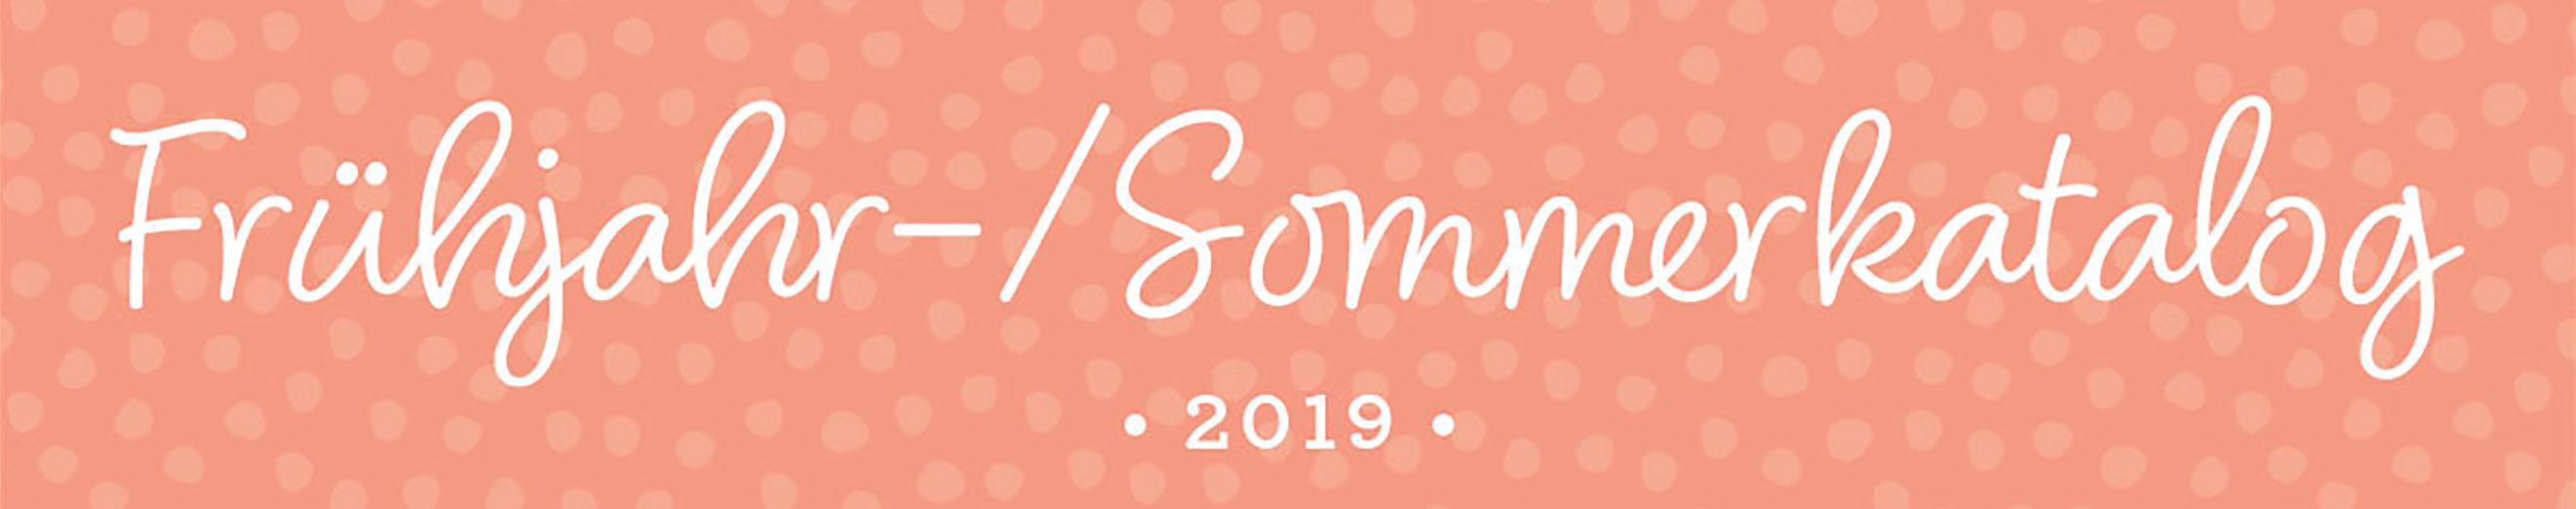 Frühjahr-/Sommerkatalog 2019